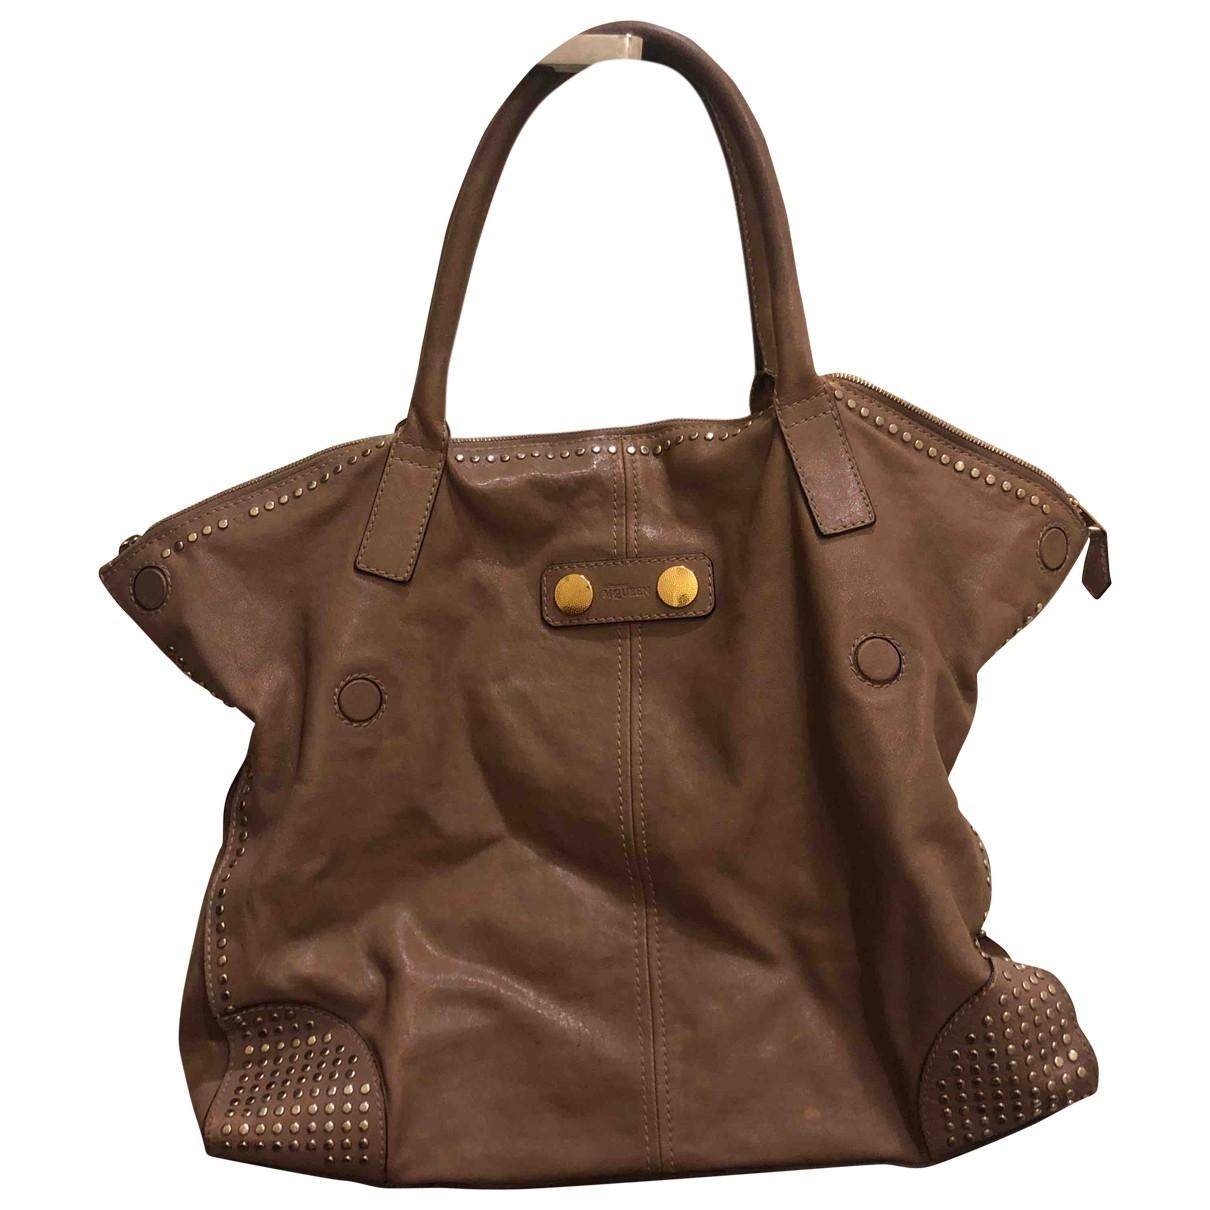 Alexander Mcqueen \N Brown Leather handbag for Women \N